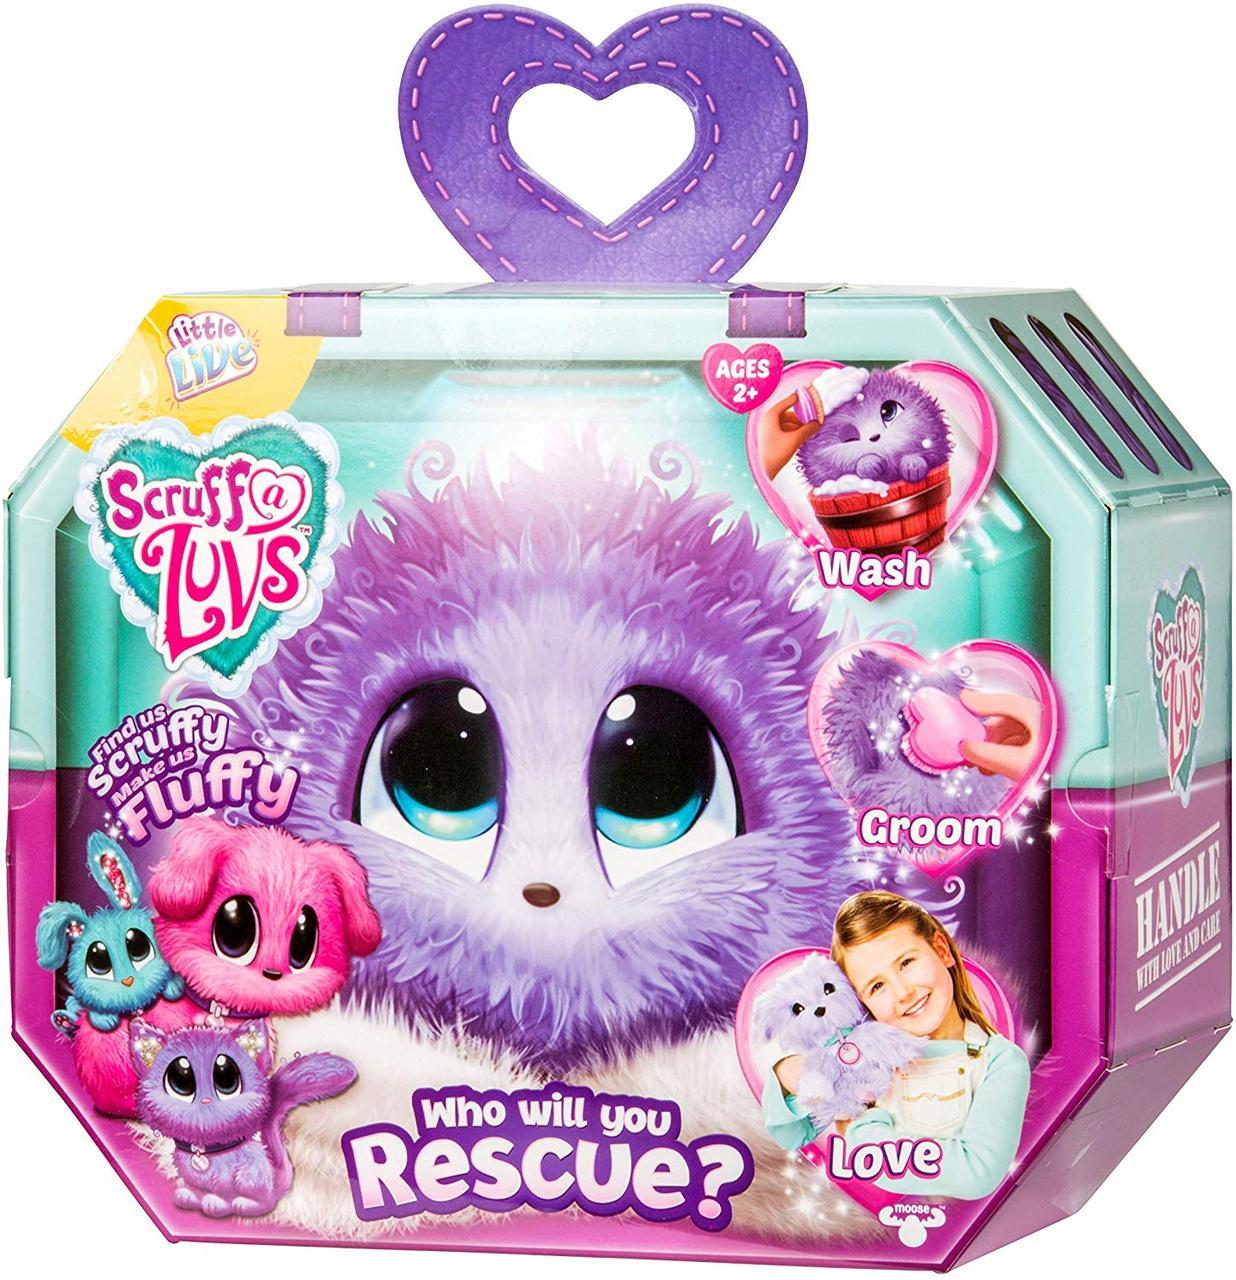 Игрушка - сюрприз Little Live Scruff A Luvs Plush Mystery Rescue Pet  Purple  Няшка - Потеряшка фиолетовая